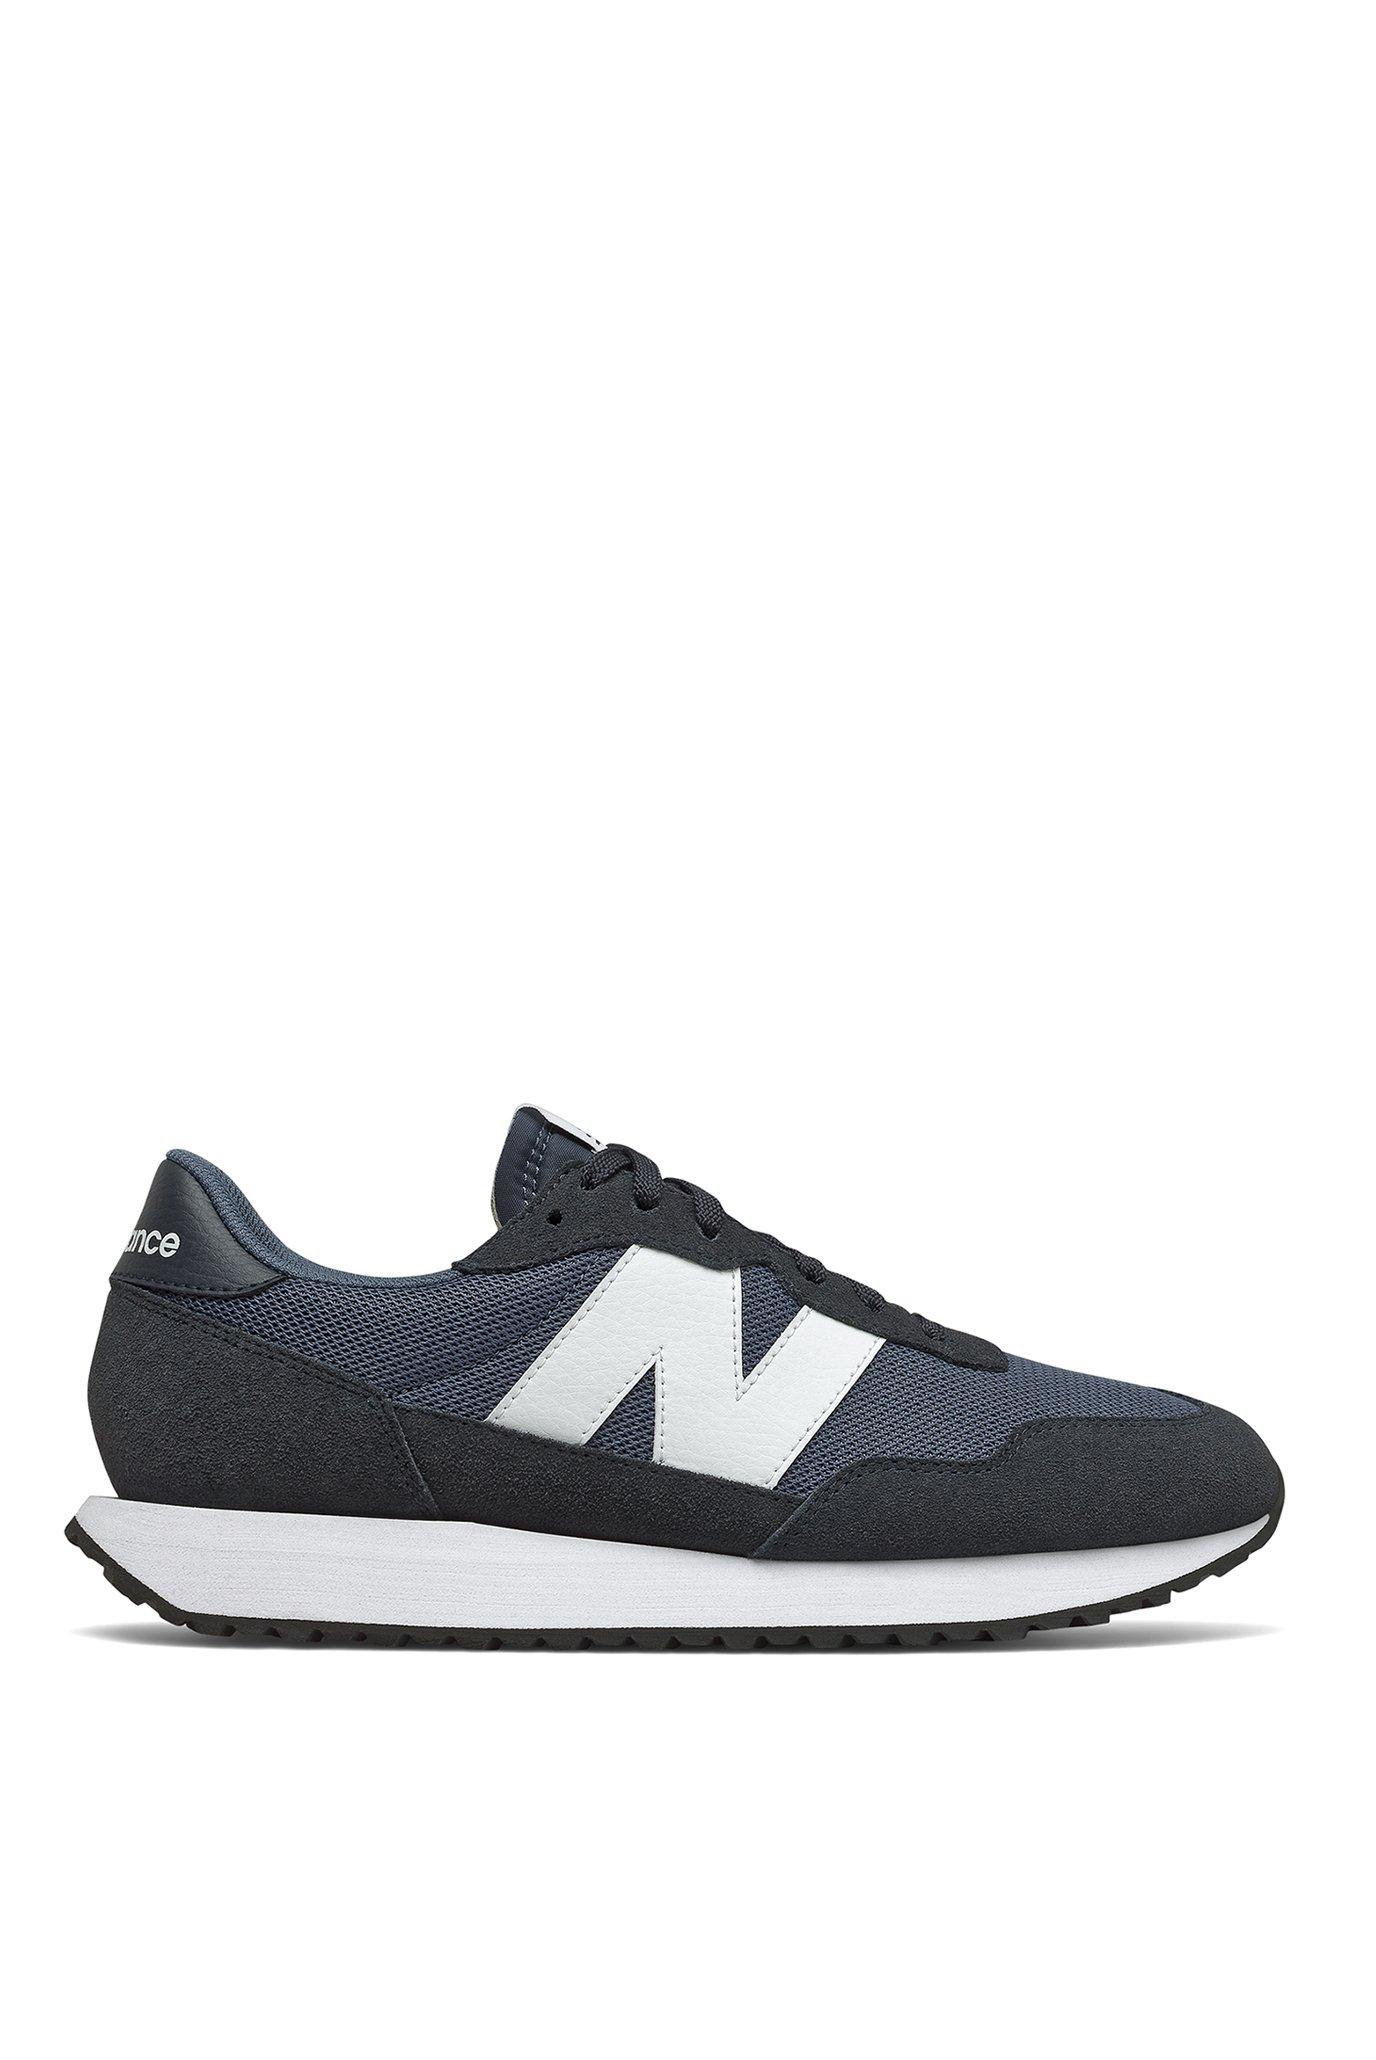 Мужские синие кроссовки 237 1